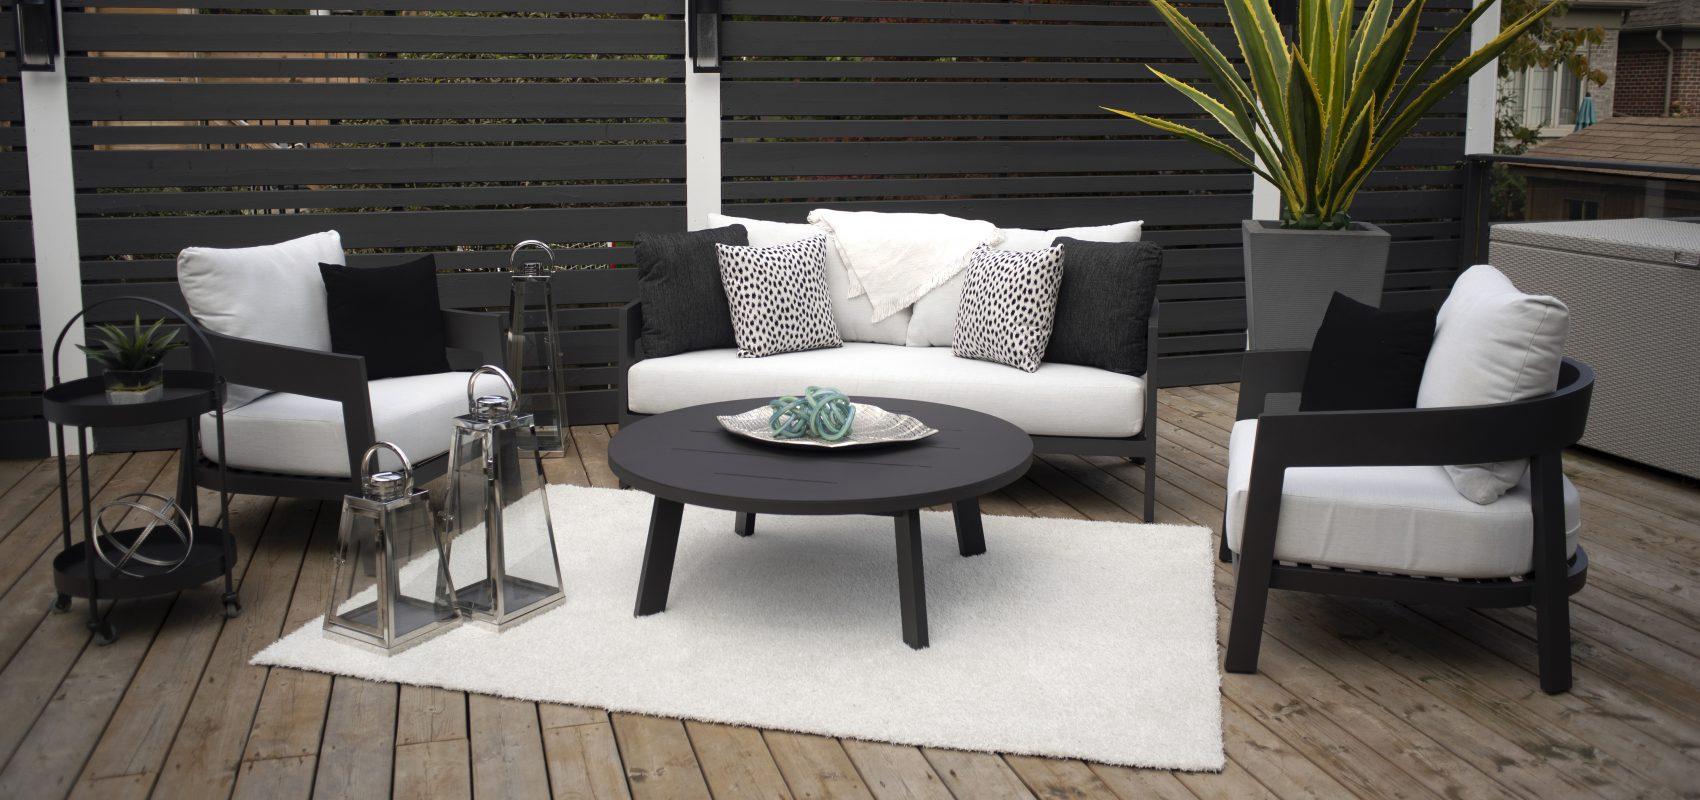 Ard Outdoor Toronto Outdoor Furniture Patio Furniture Patio Sets